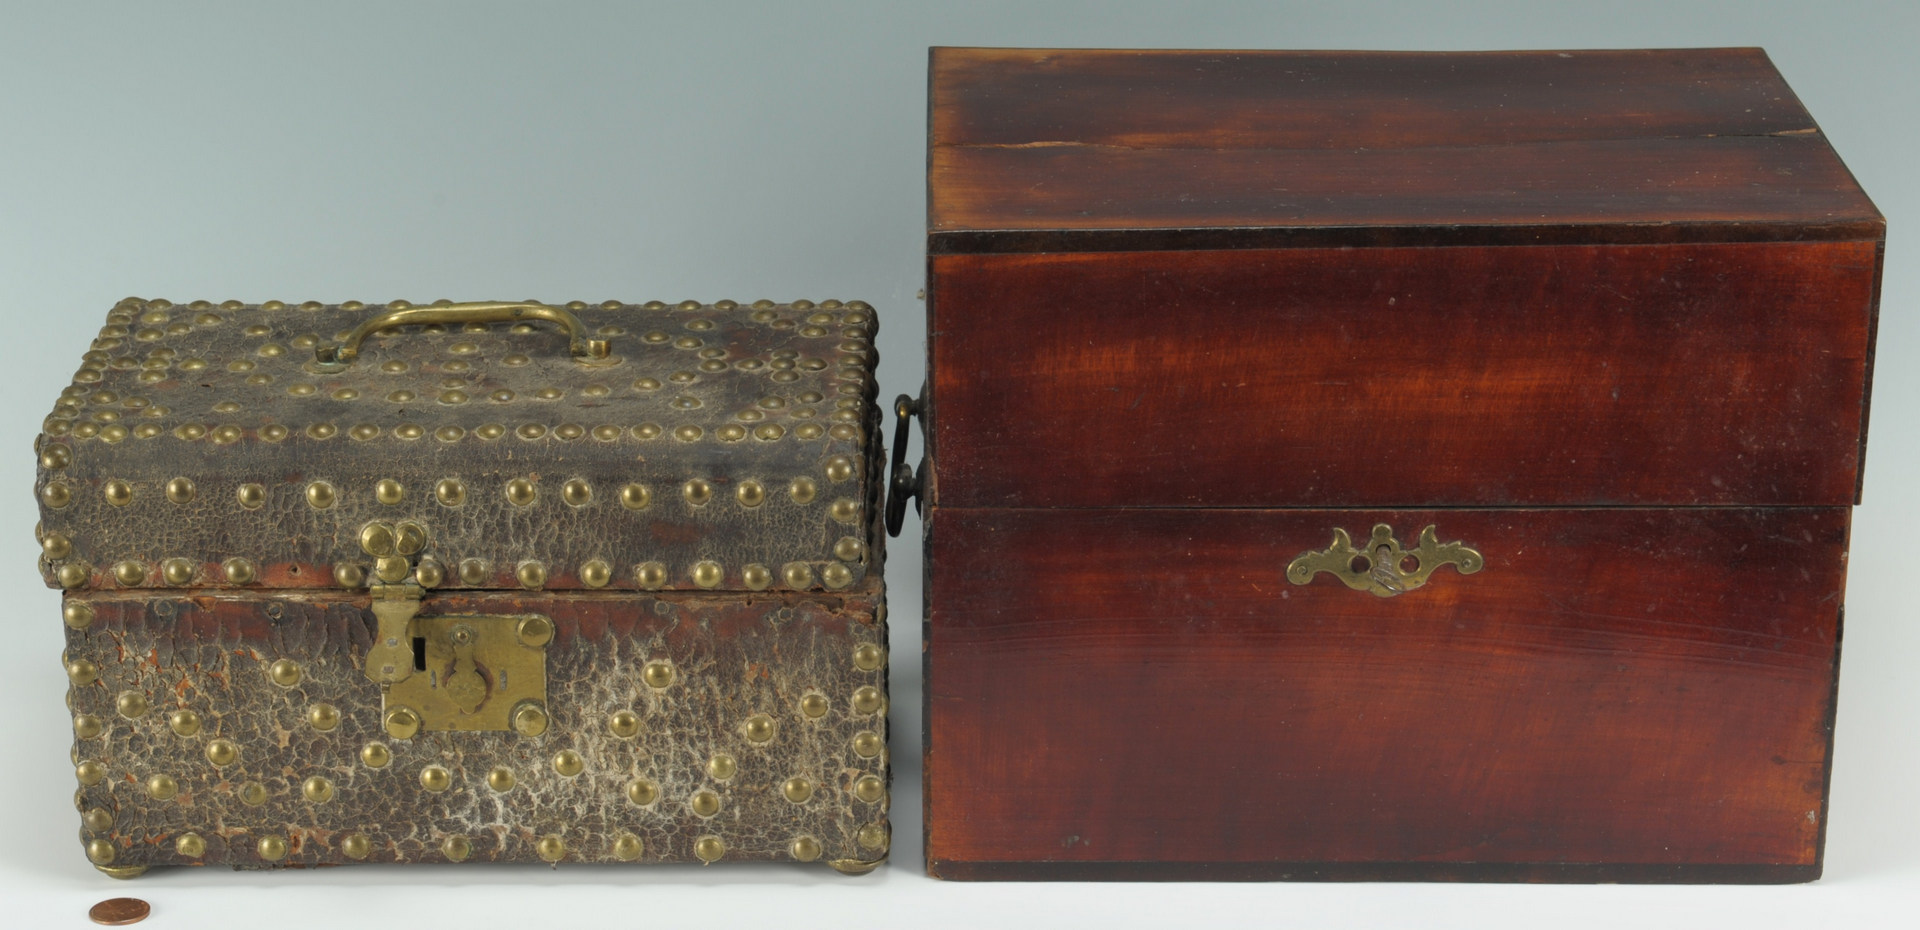 Lot 323: 2 English Boxes, Bottle & Document